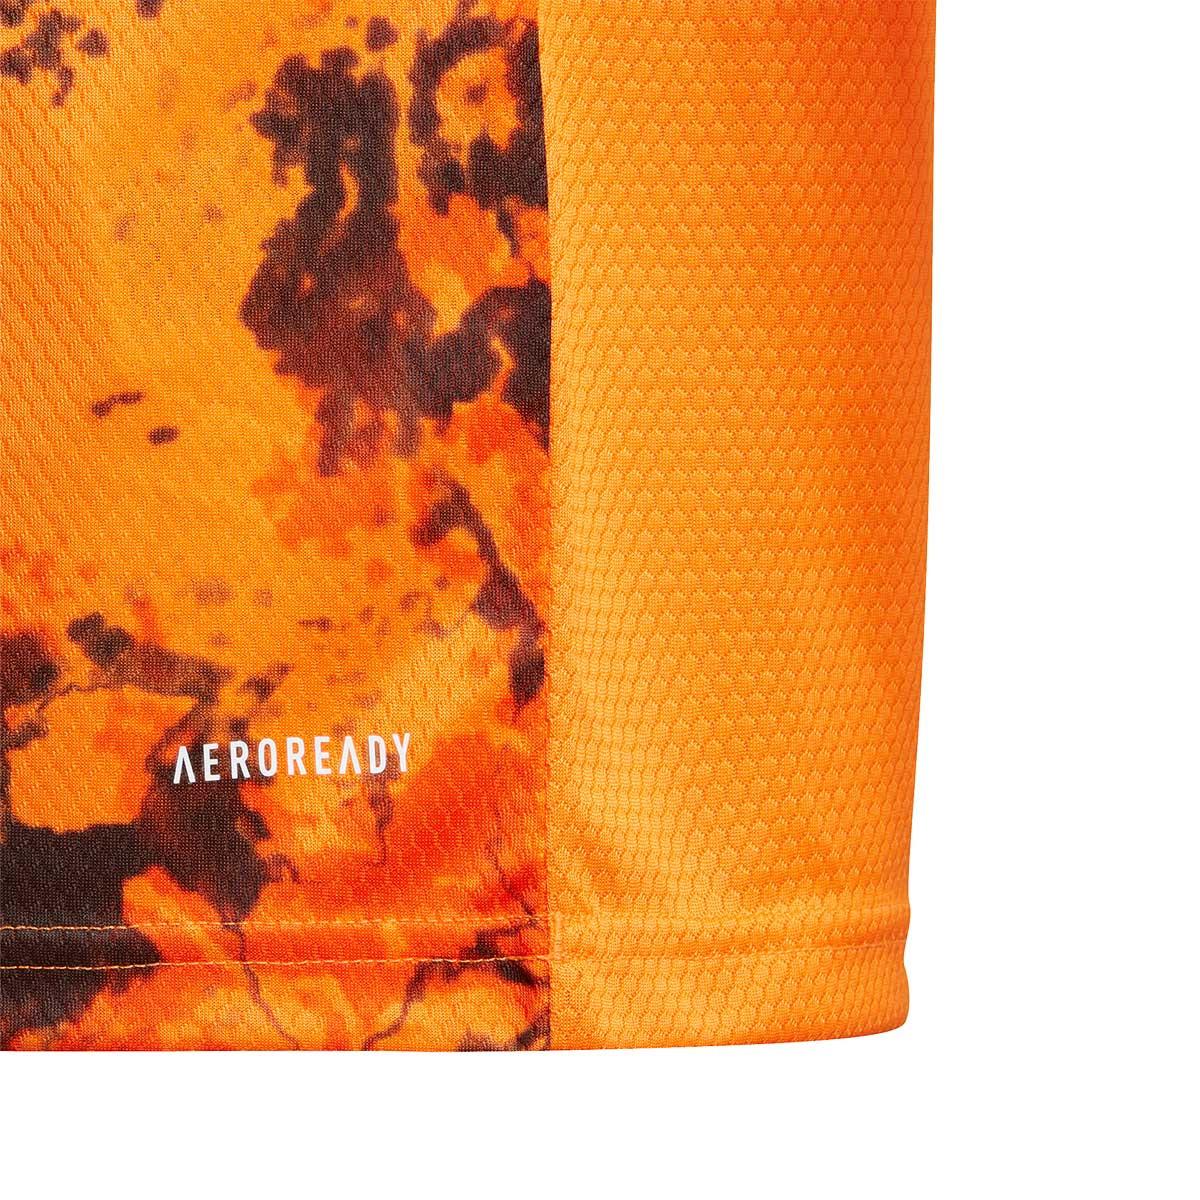 jersey adidas kids juventus 2020 2021 third bahia orange football store futbol emotion football boots